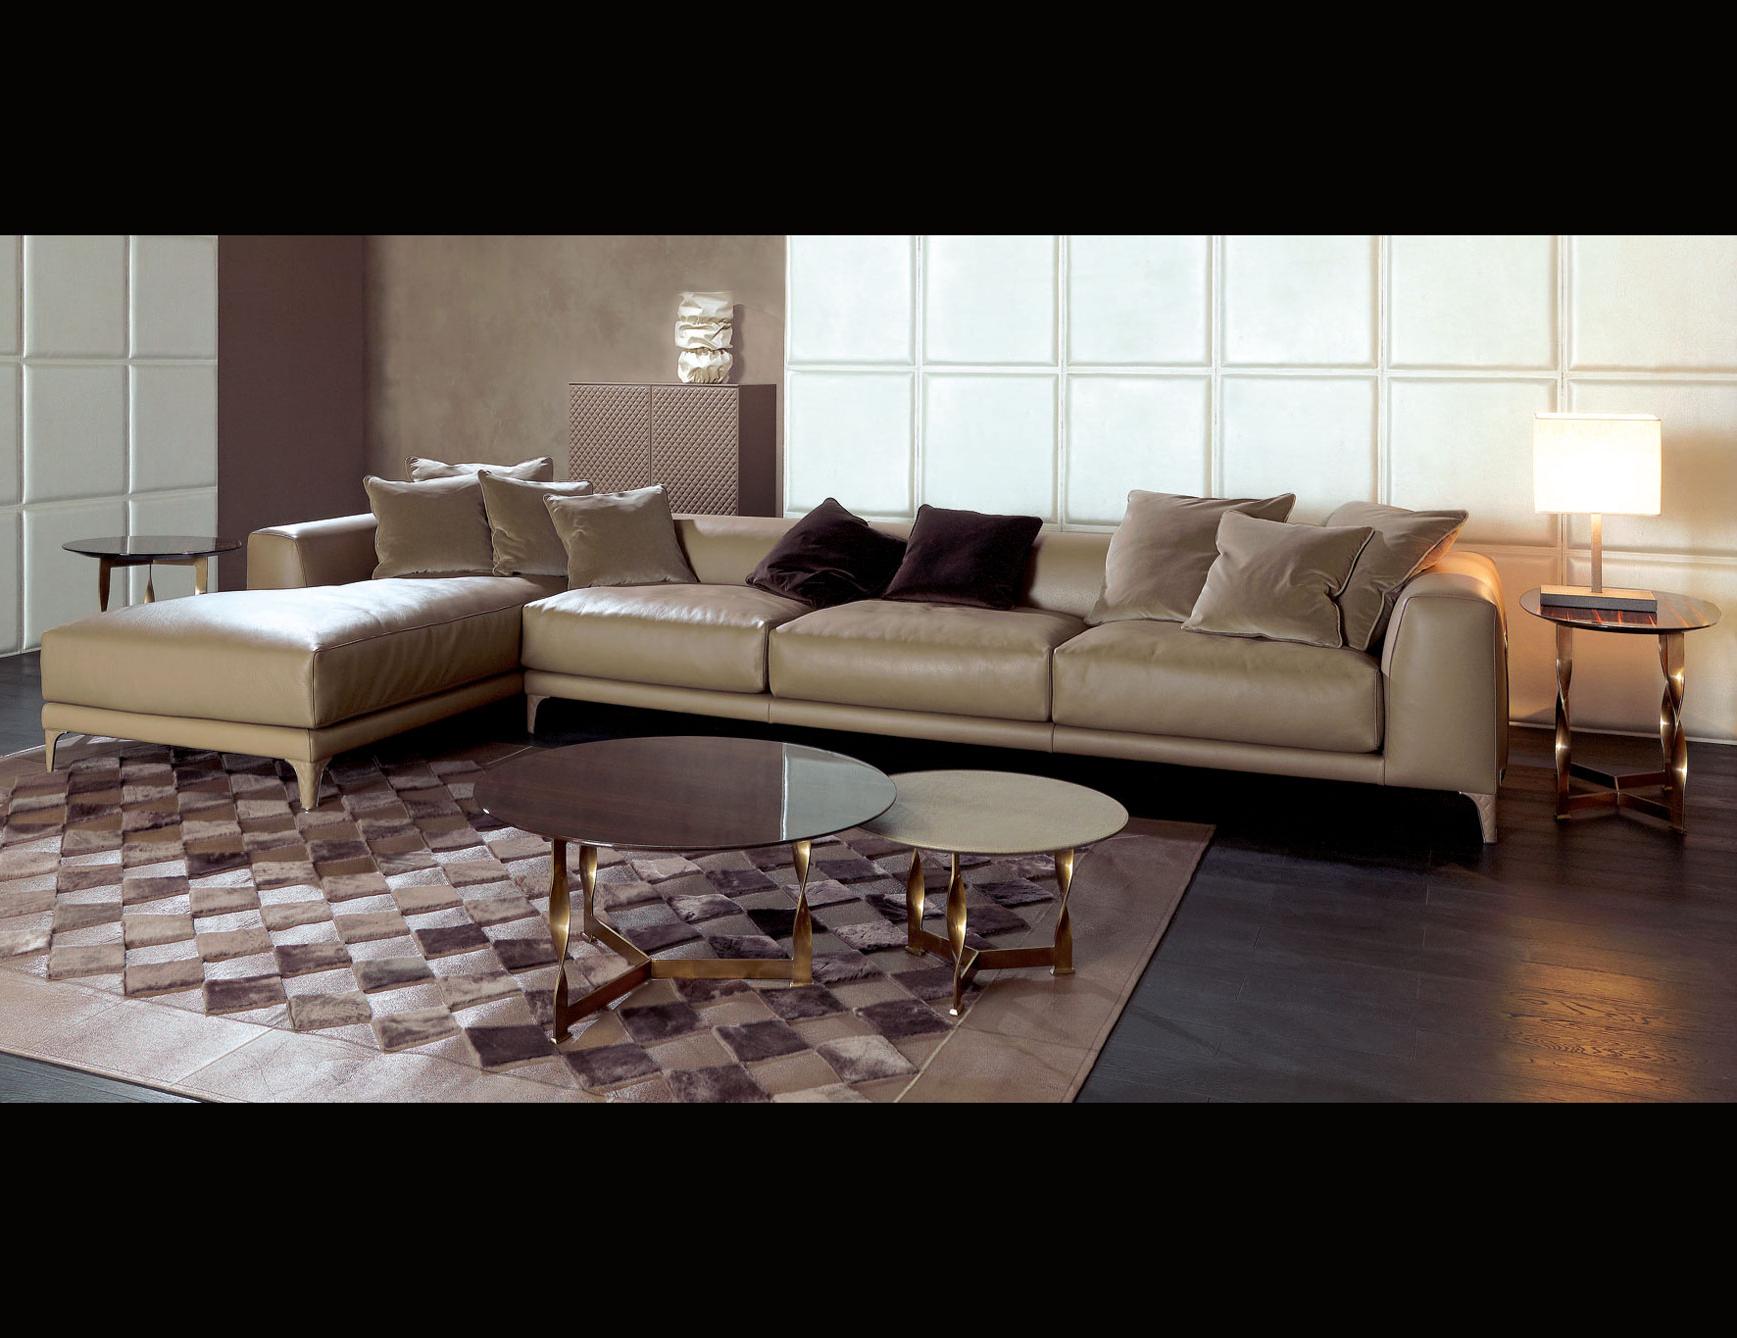 Sofas Leon 3id6 Nella Vetrina Rugiano Leon W128 Upholstered sofa